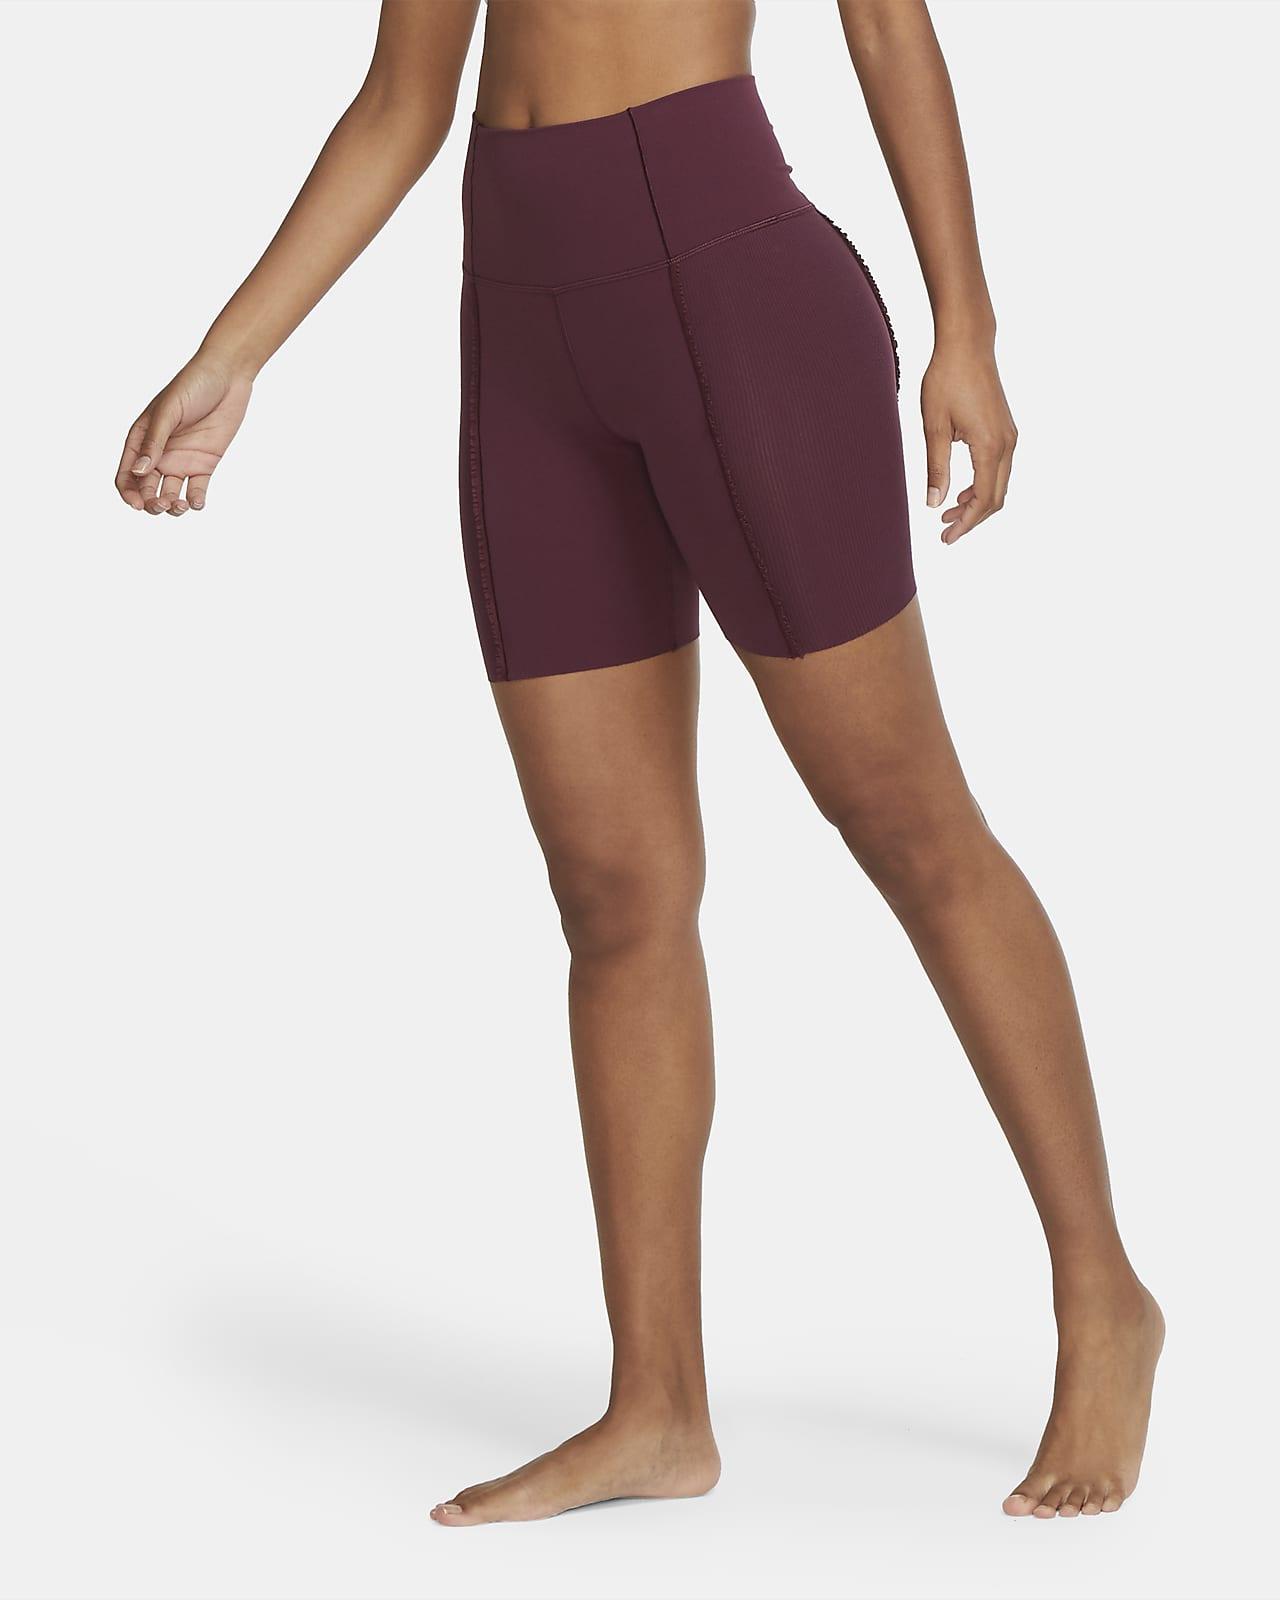 Nike Yoga Women's Infinalon Shorts